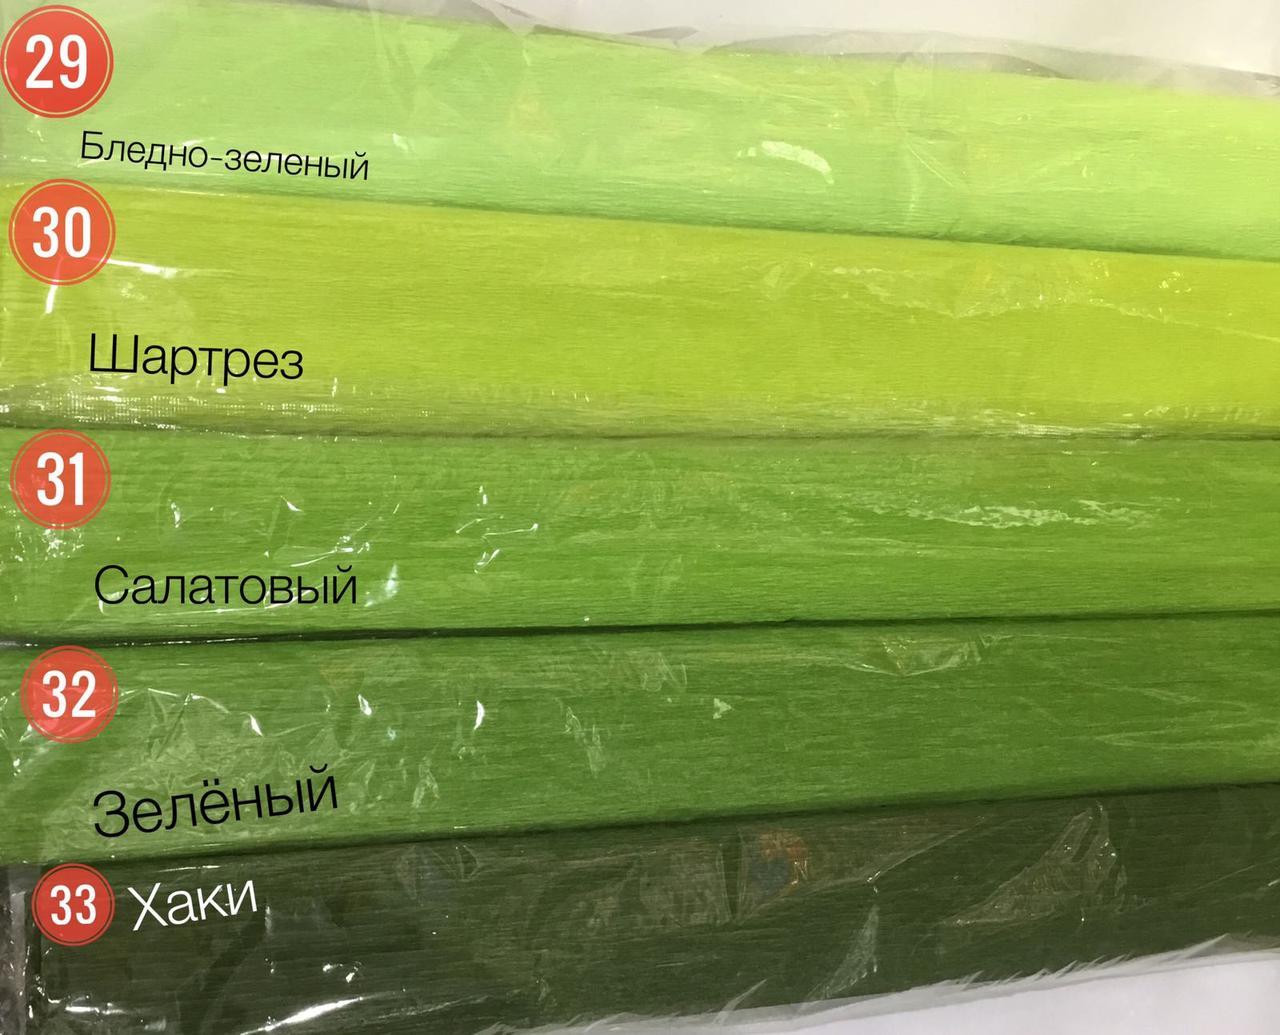 Гофрированная бумага 170 г/м2 50 х 250 см цвет БЛЕДНО ЗЕЛЕНЫЙ